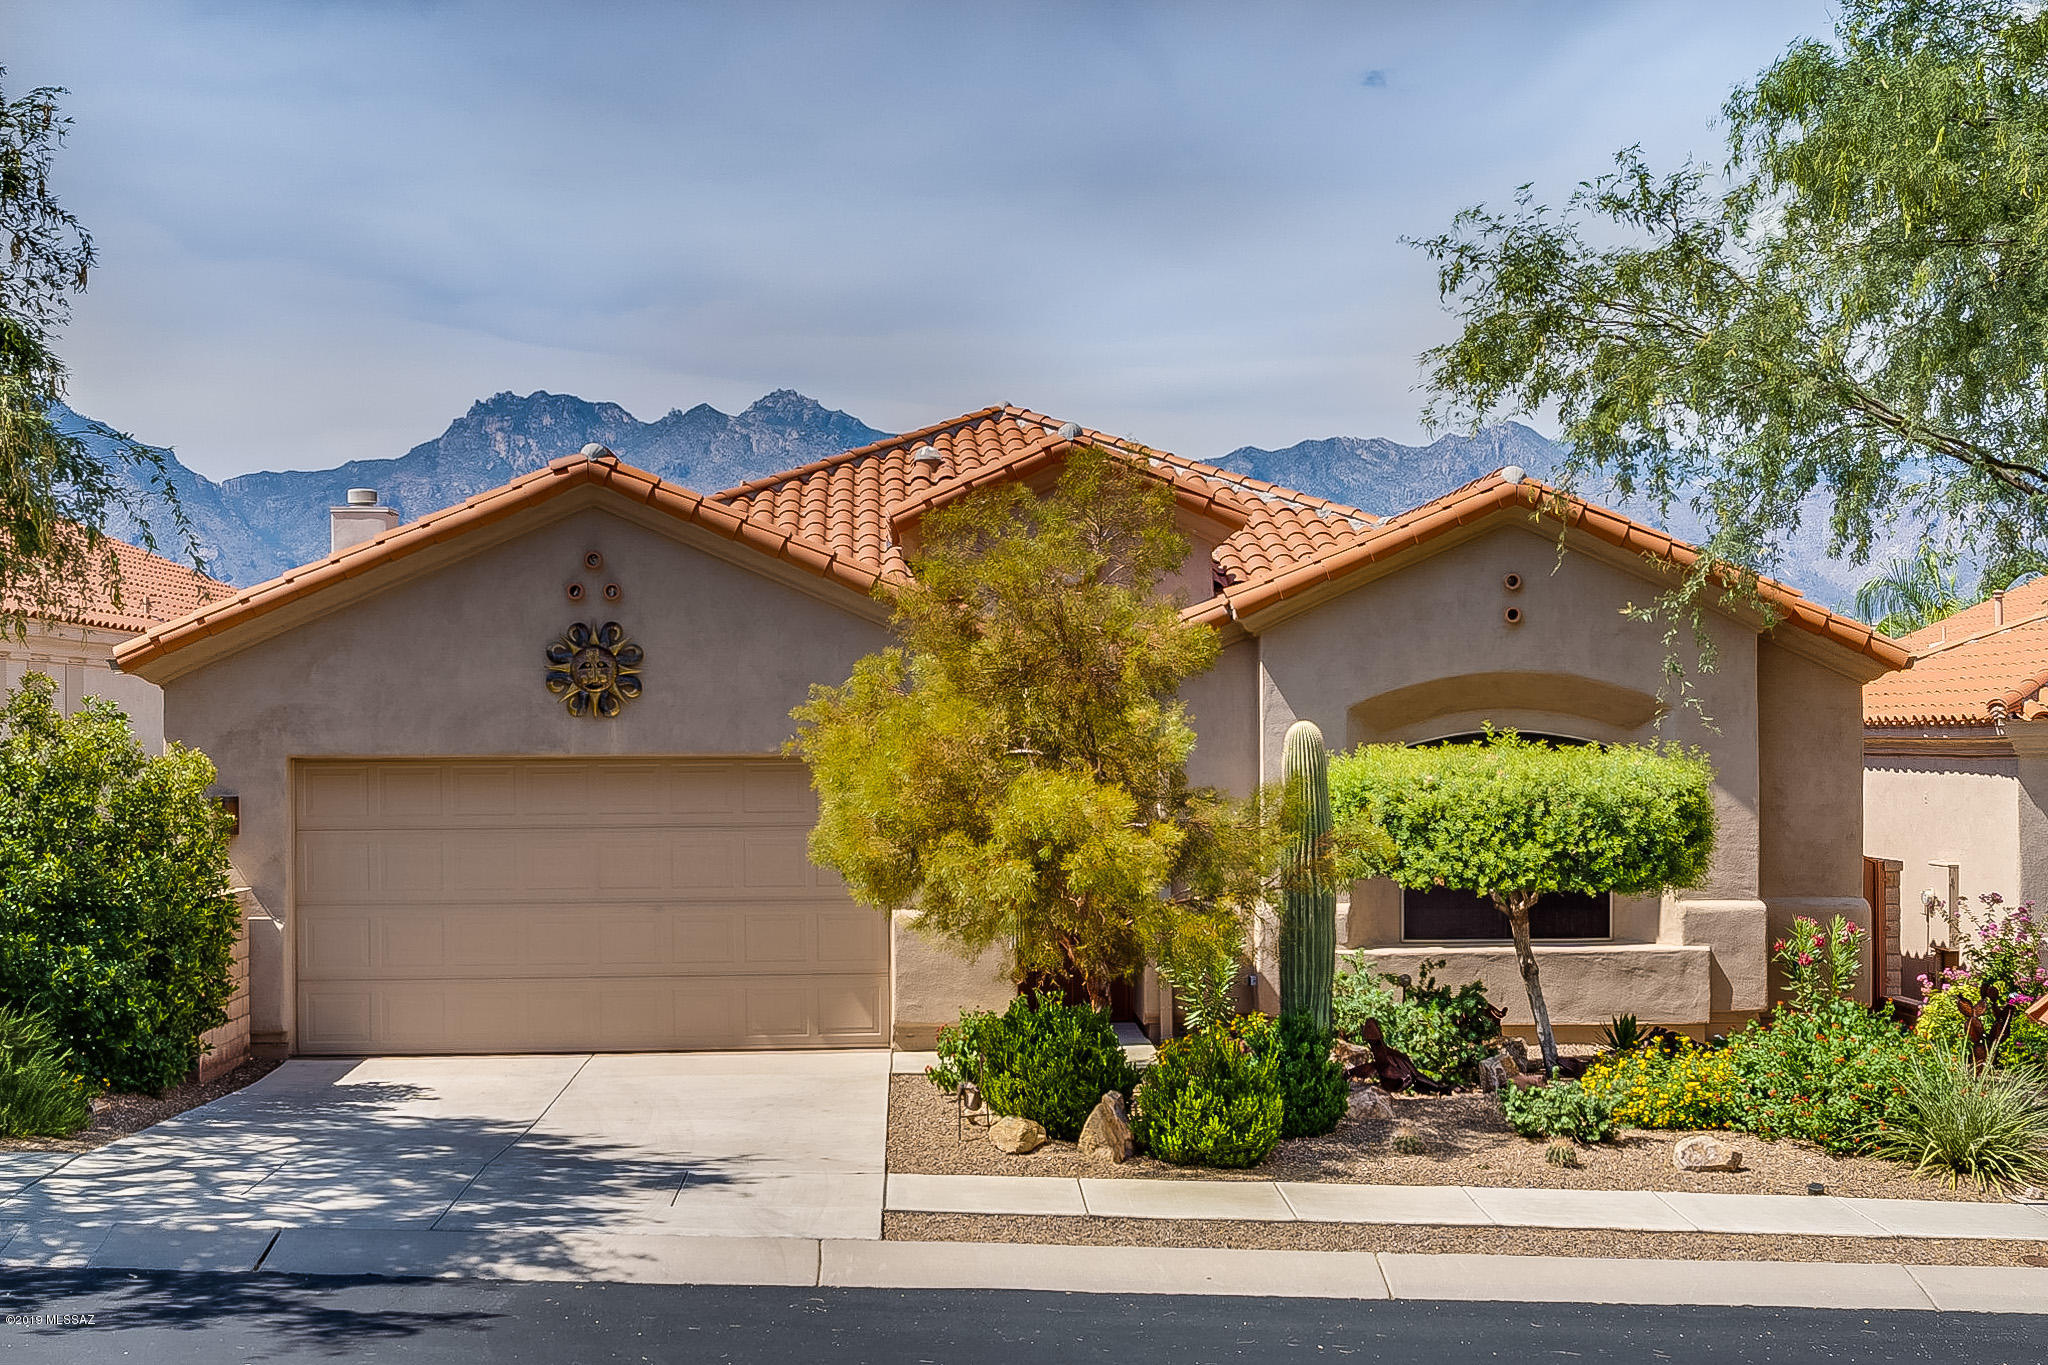 Photo of 7341 E Vuelta Rancho Mesquite, Tucson, AZ 85715